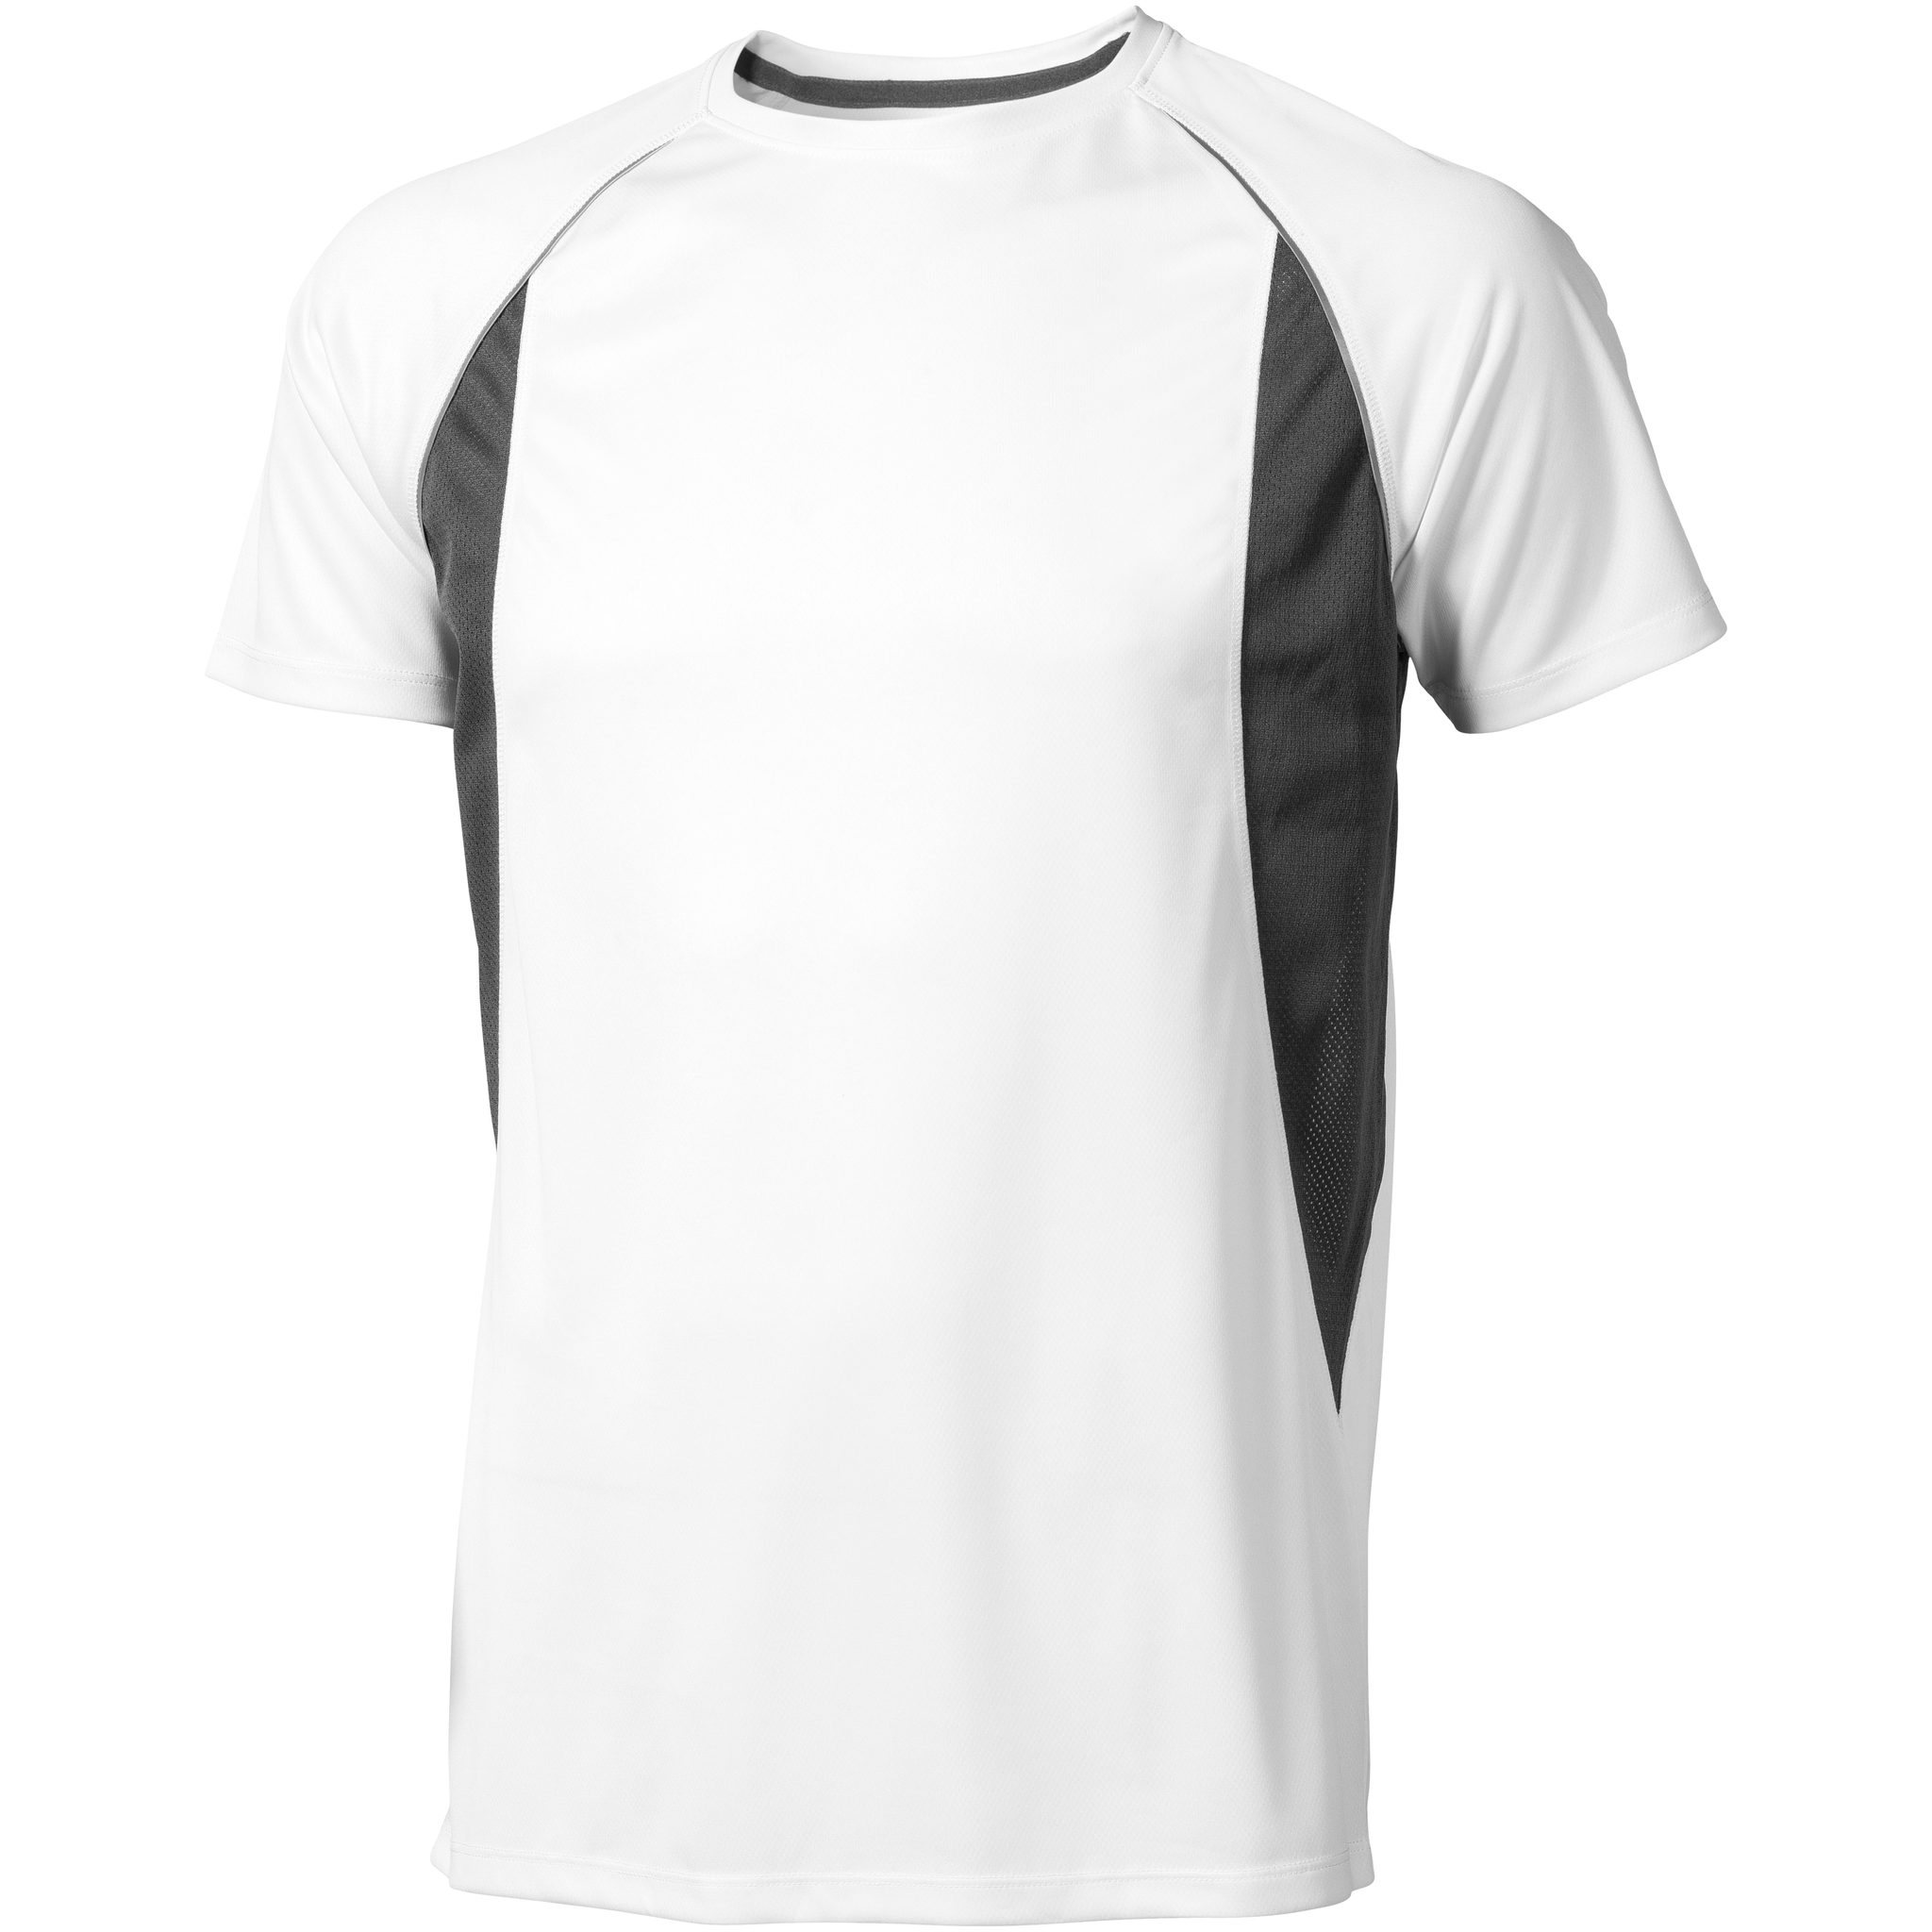 Elevate Mens Quebec Short Sleeve T-Shirt (XXXL) (White/Anthracite)